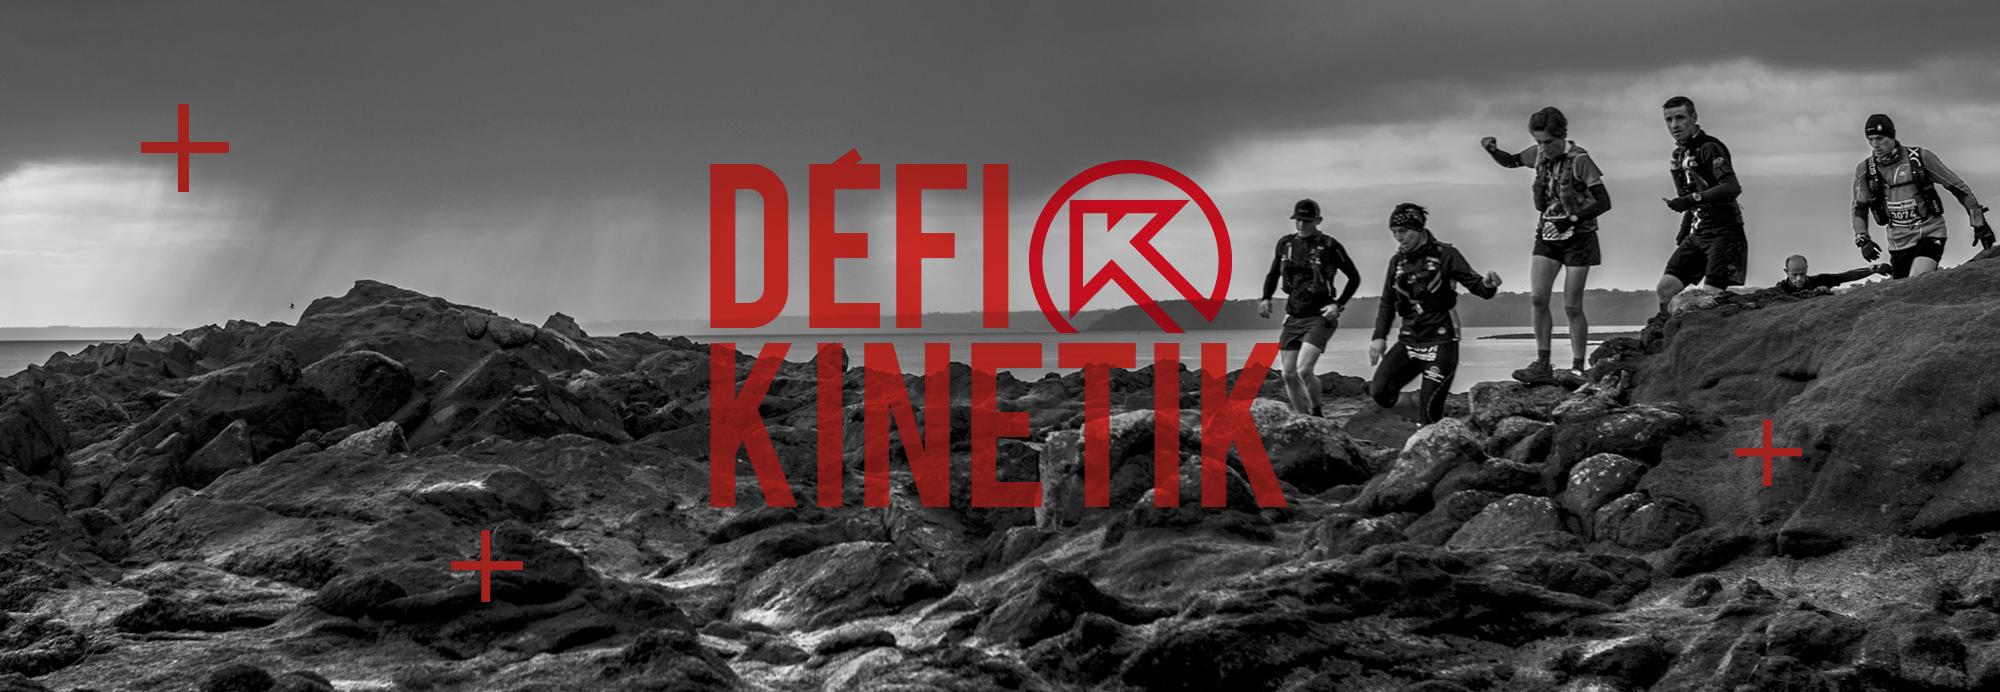 banner-defi_Kinetik